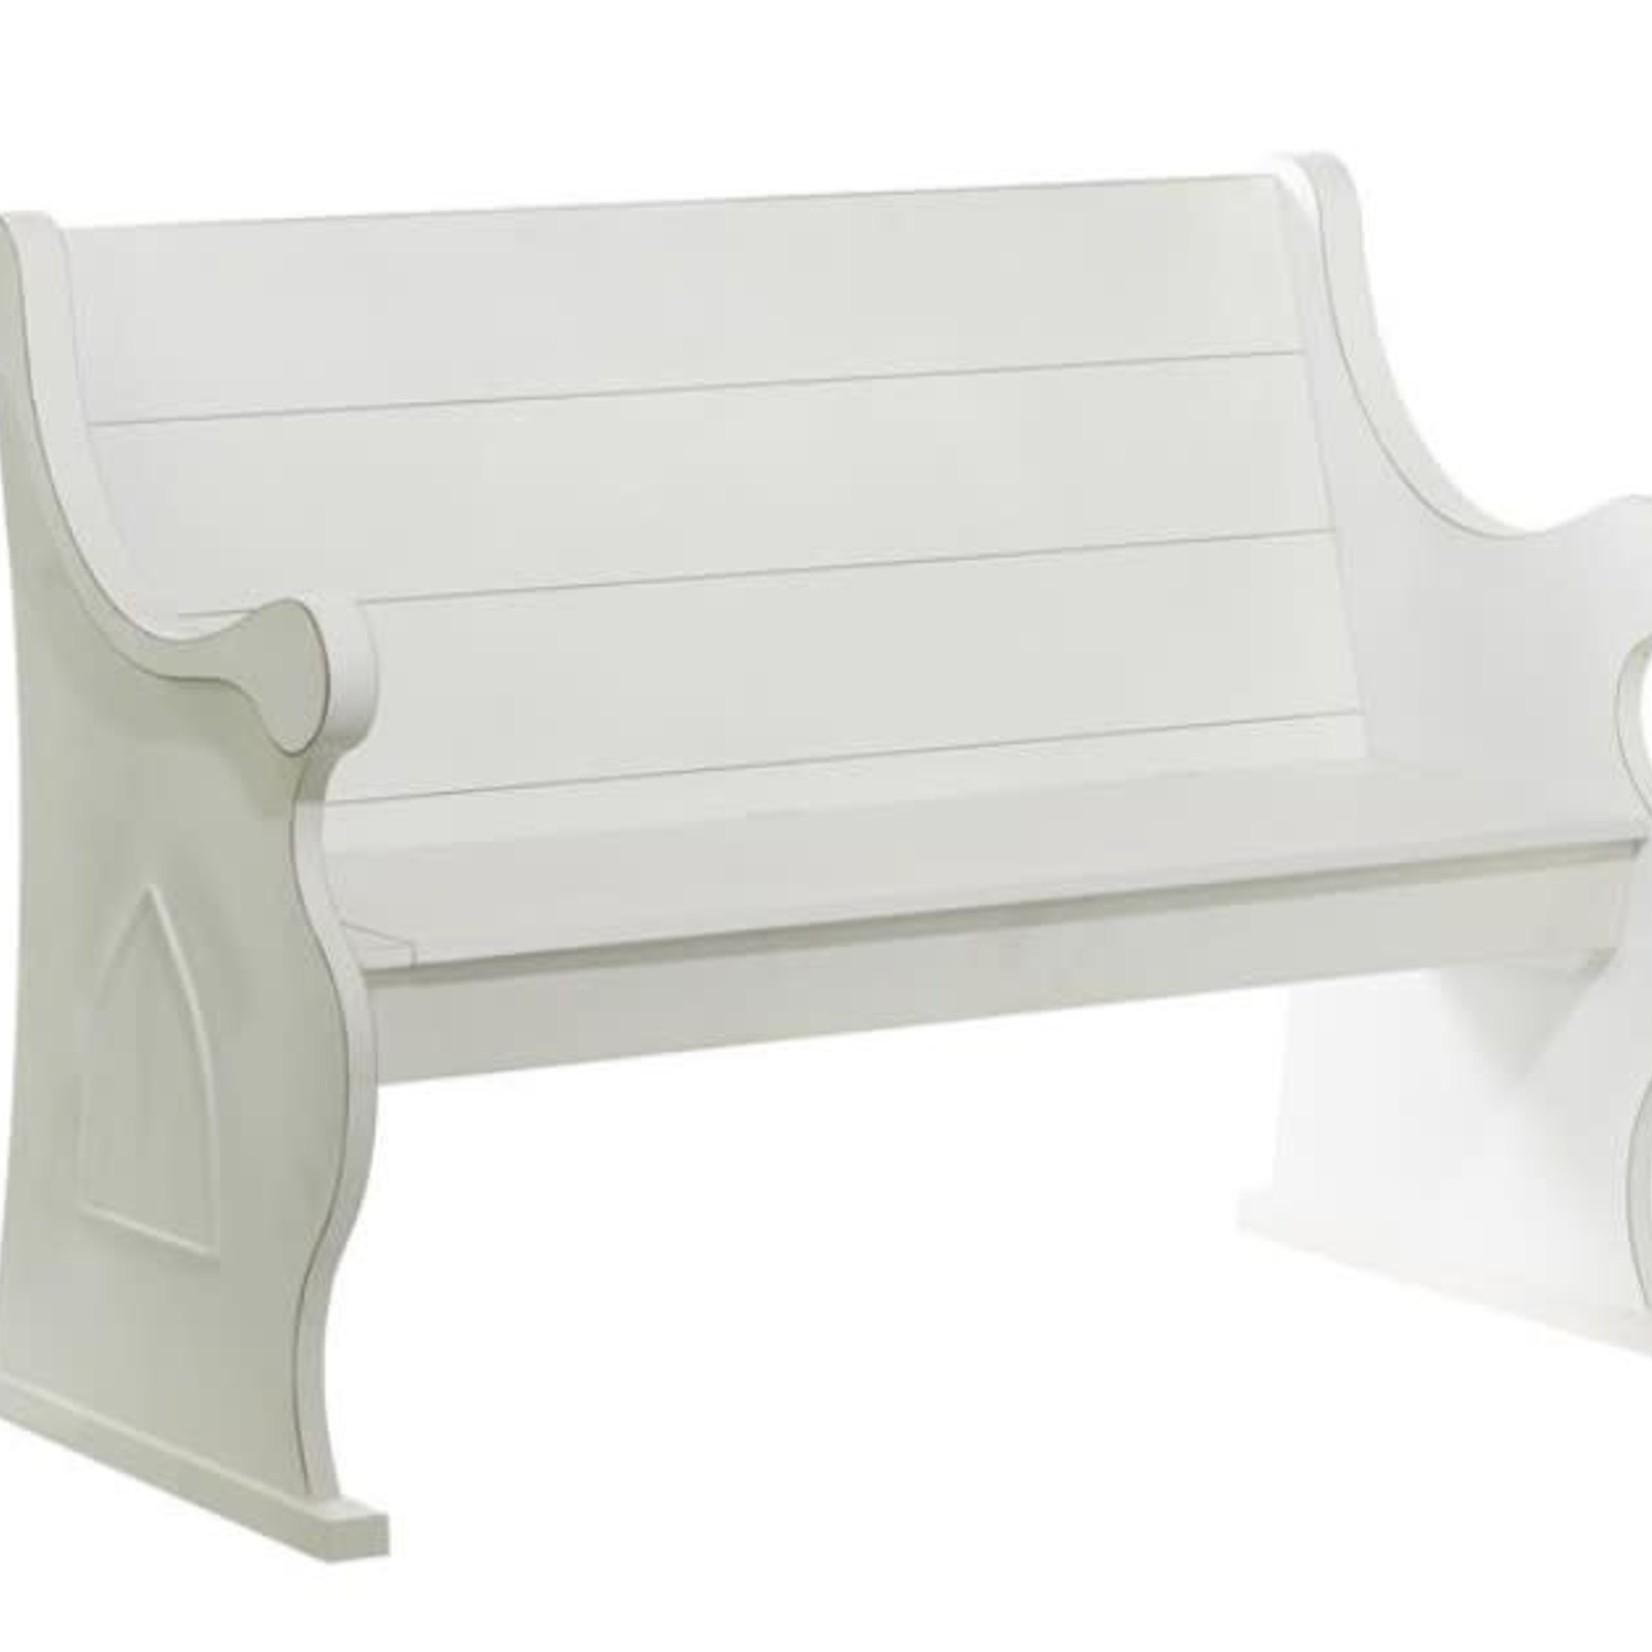 White Church Pew Bench